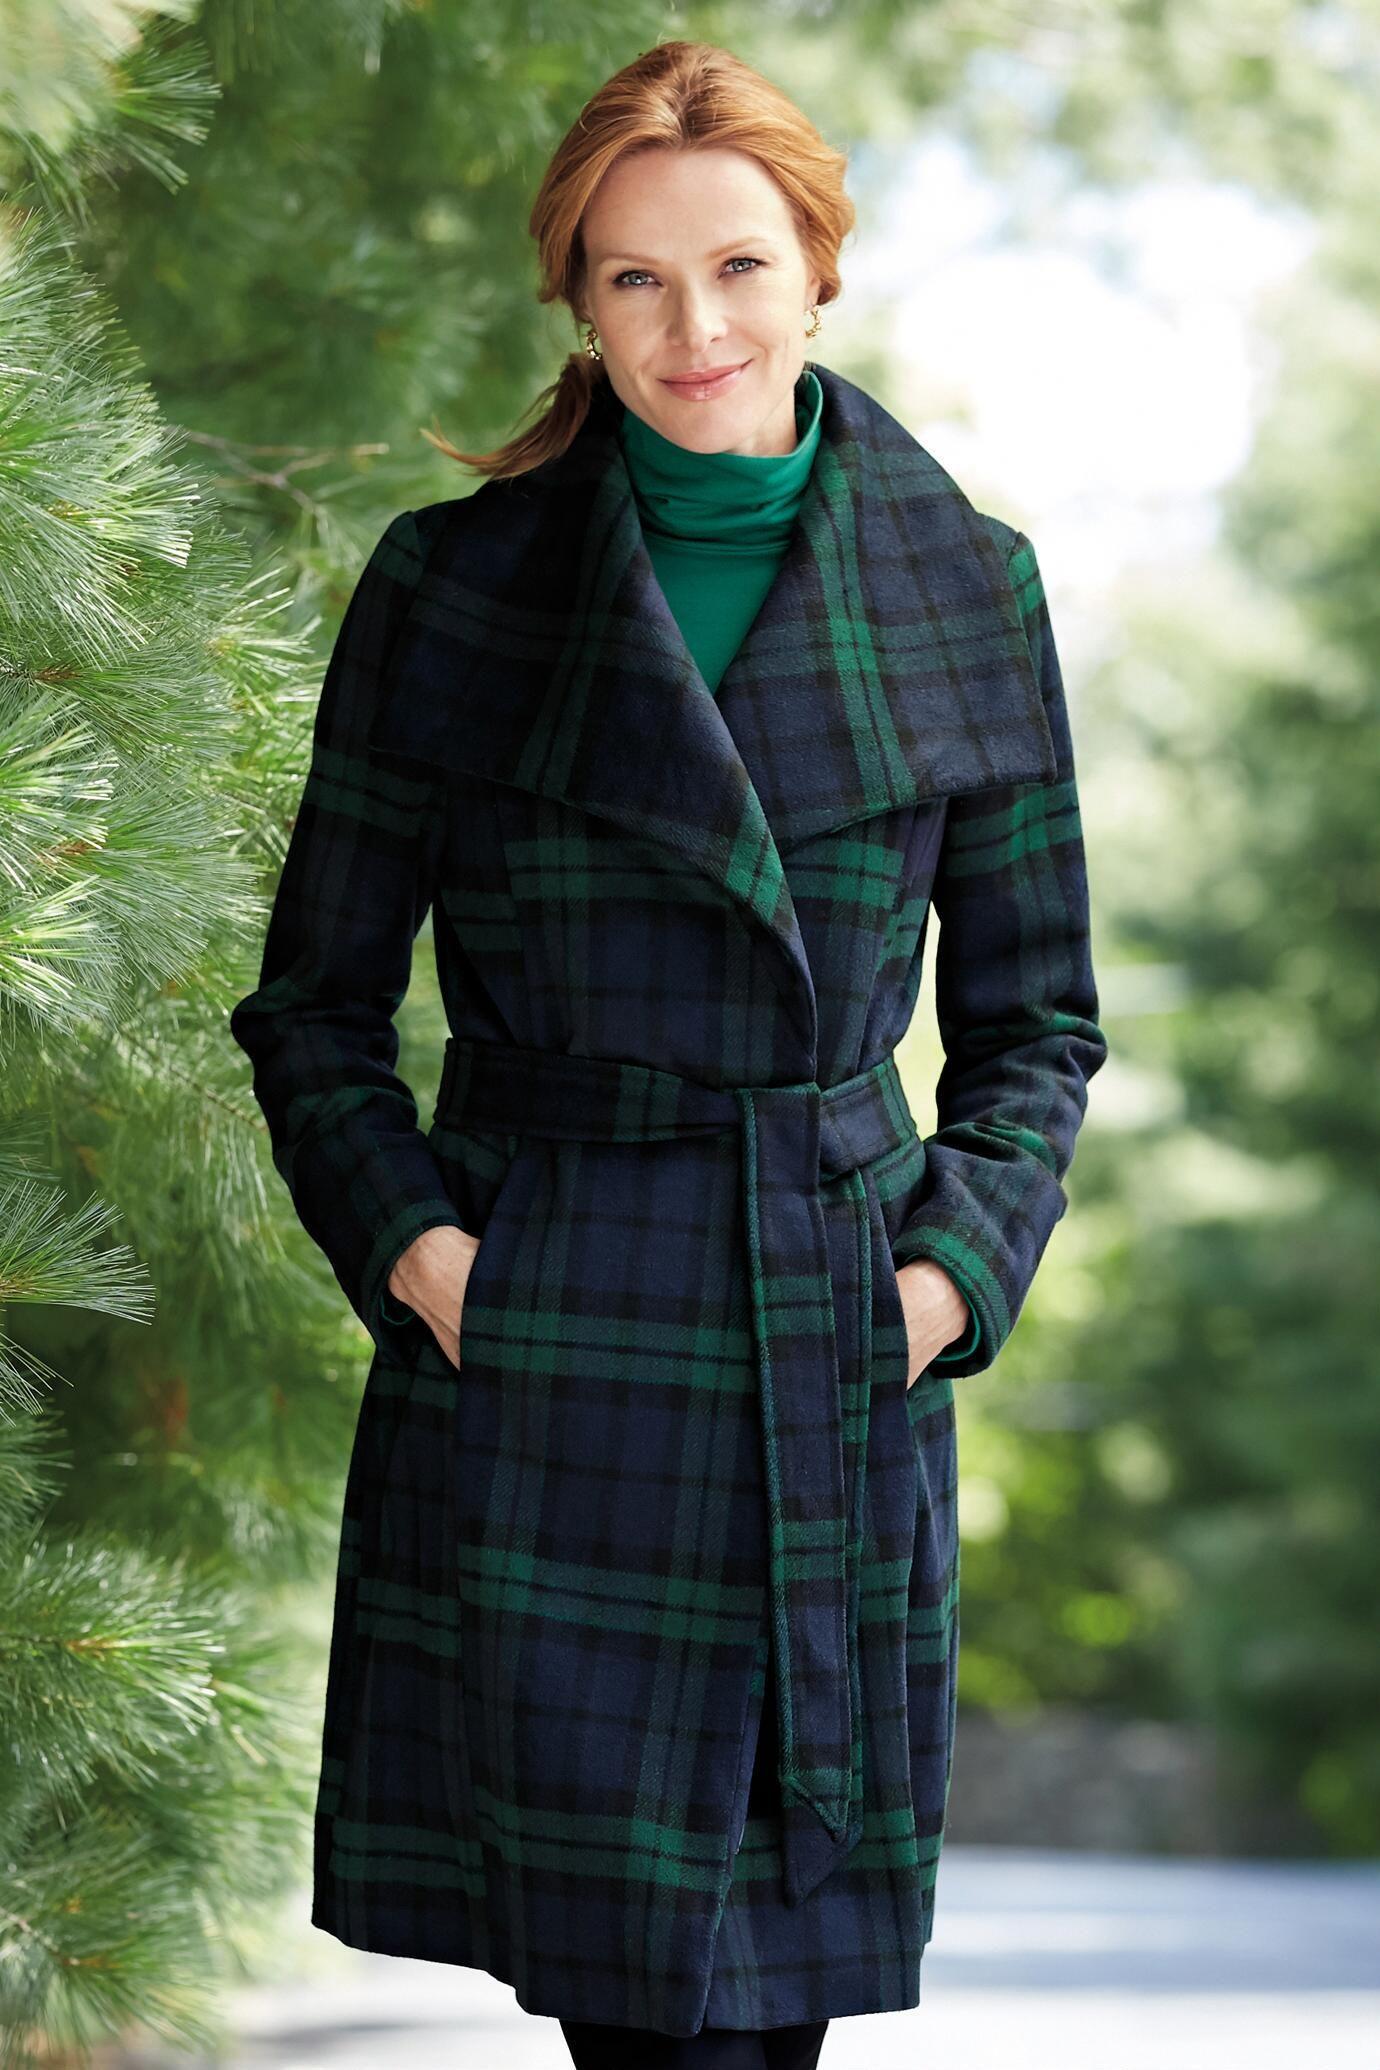 2d7a59f95 Tartan Plaid Coat: Classic Women's Clothing from #ChadwicksofBoston $99.99